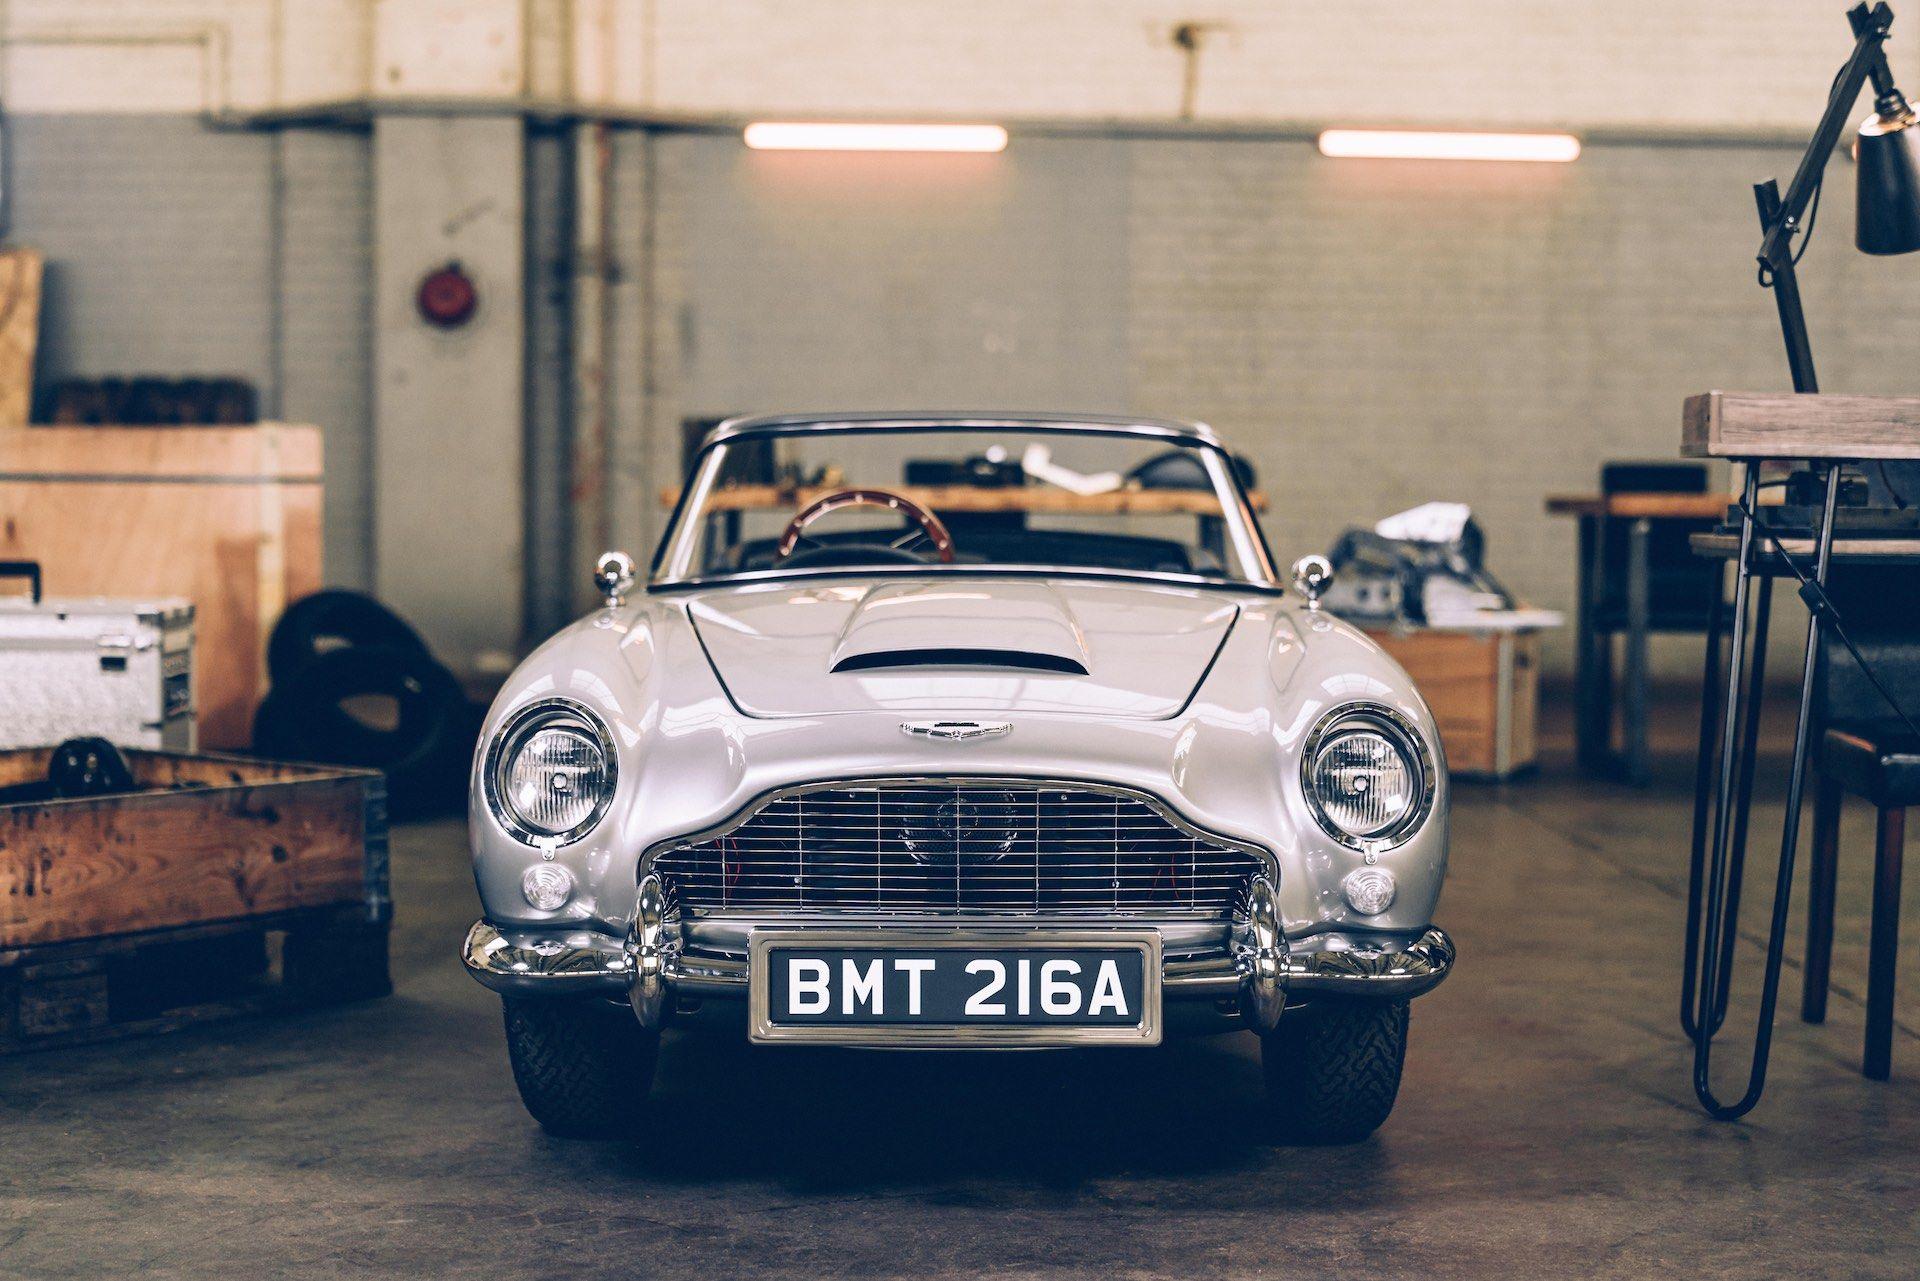 Aston-Martin-DB5-Junior-James-Bond-Edition-3